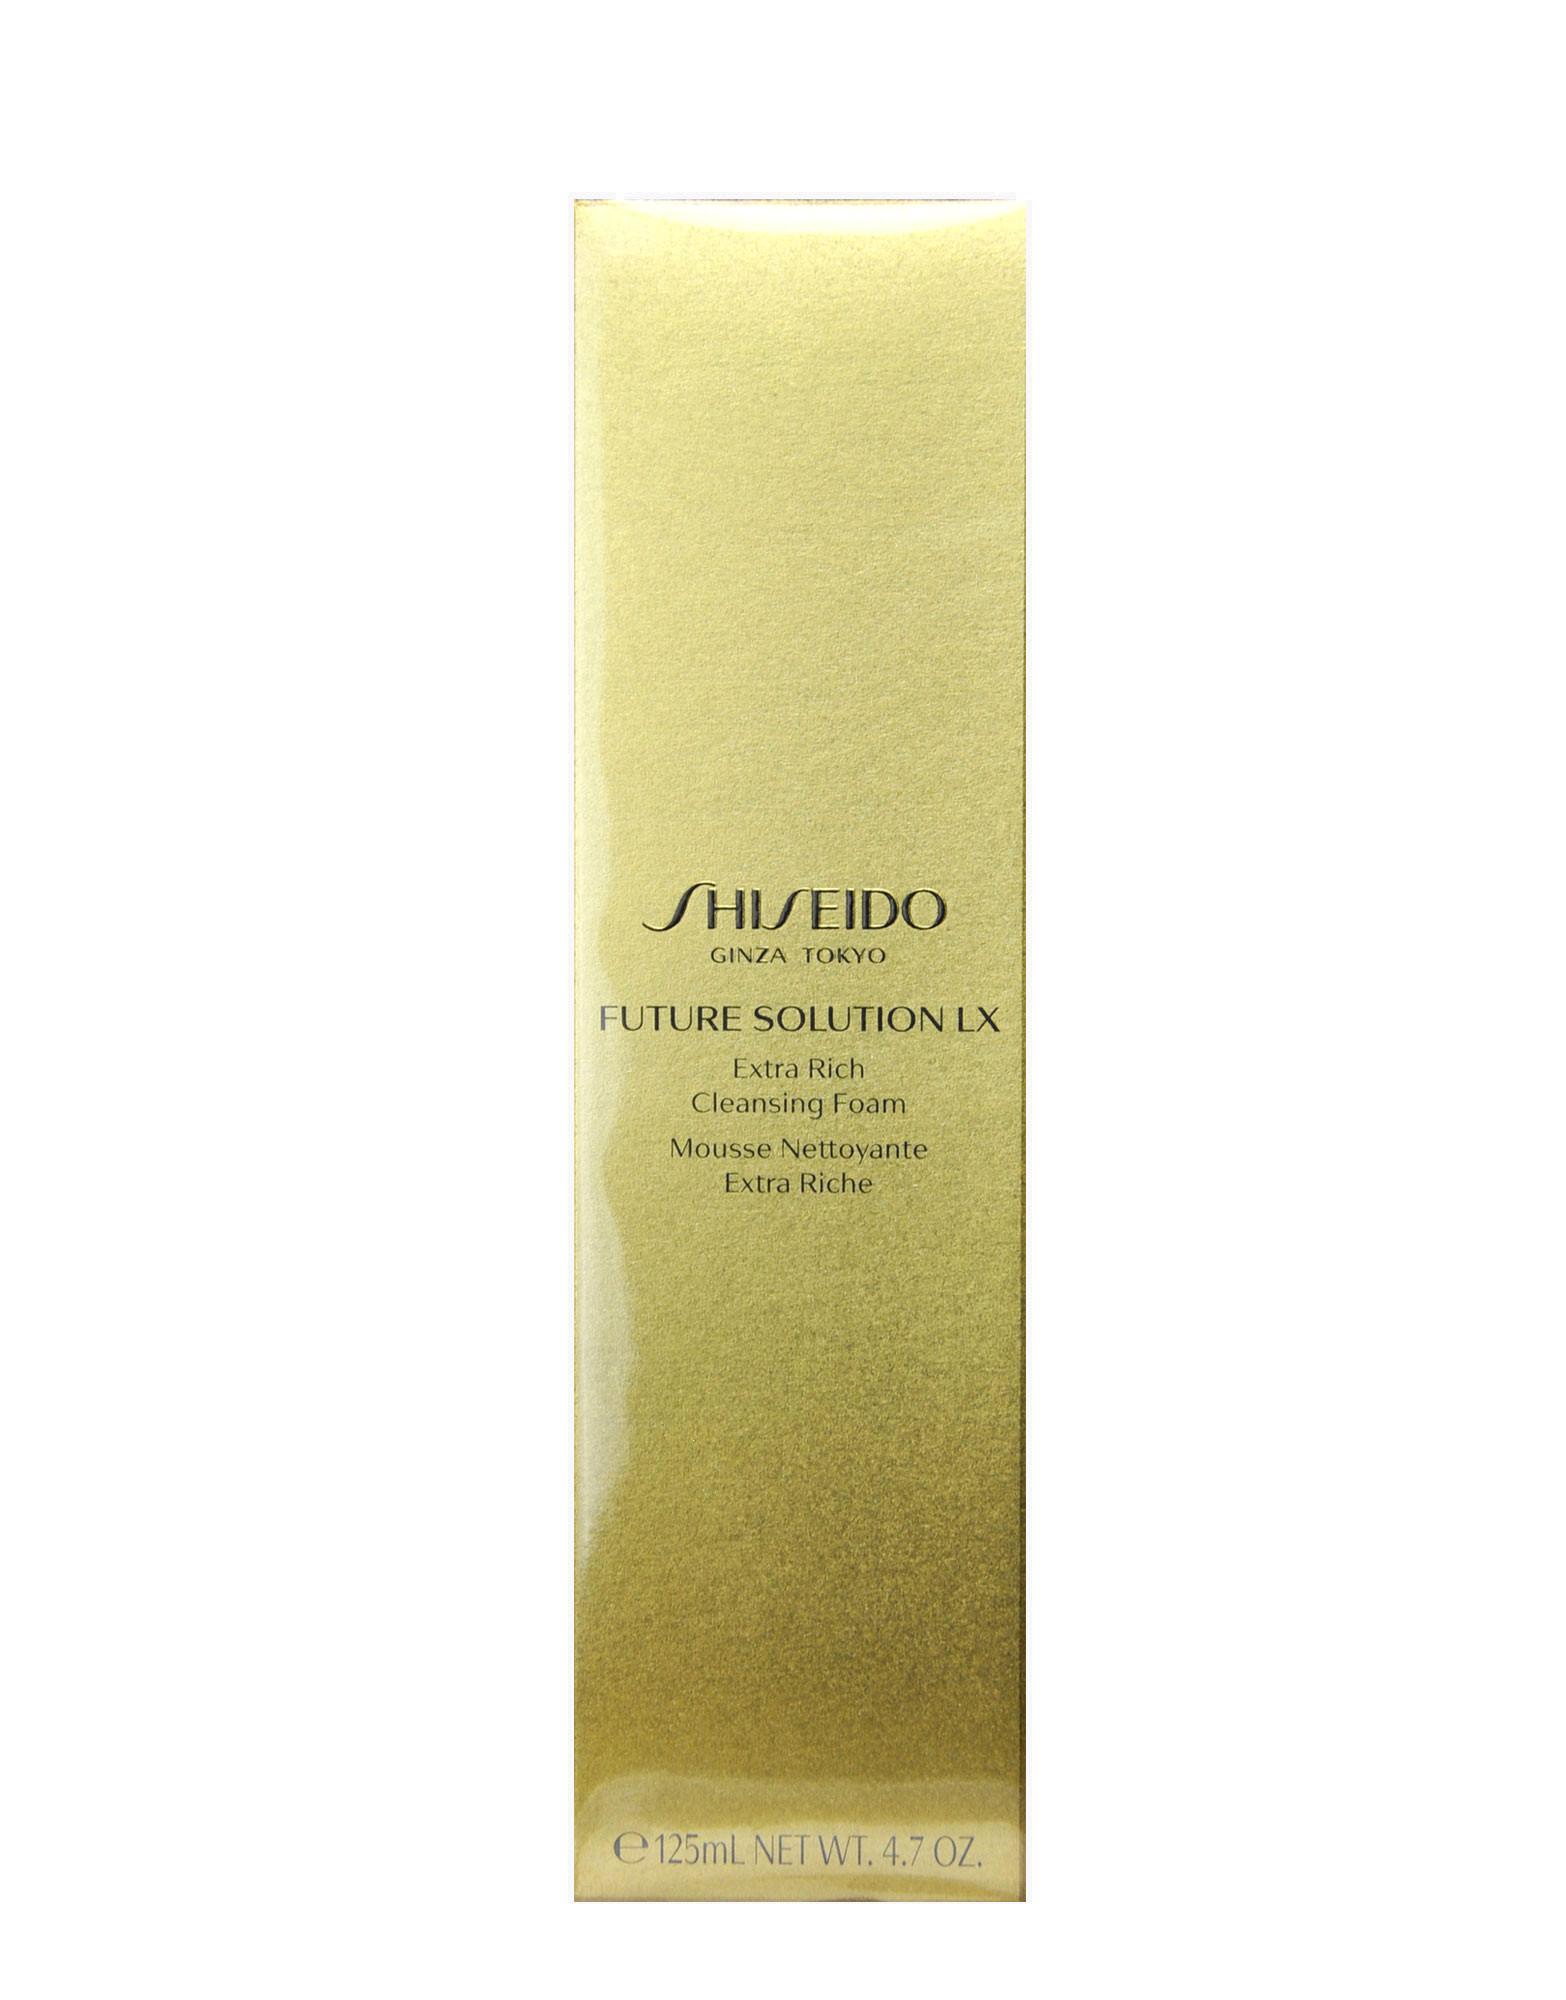 Doubt shiseido facial cleansing